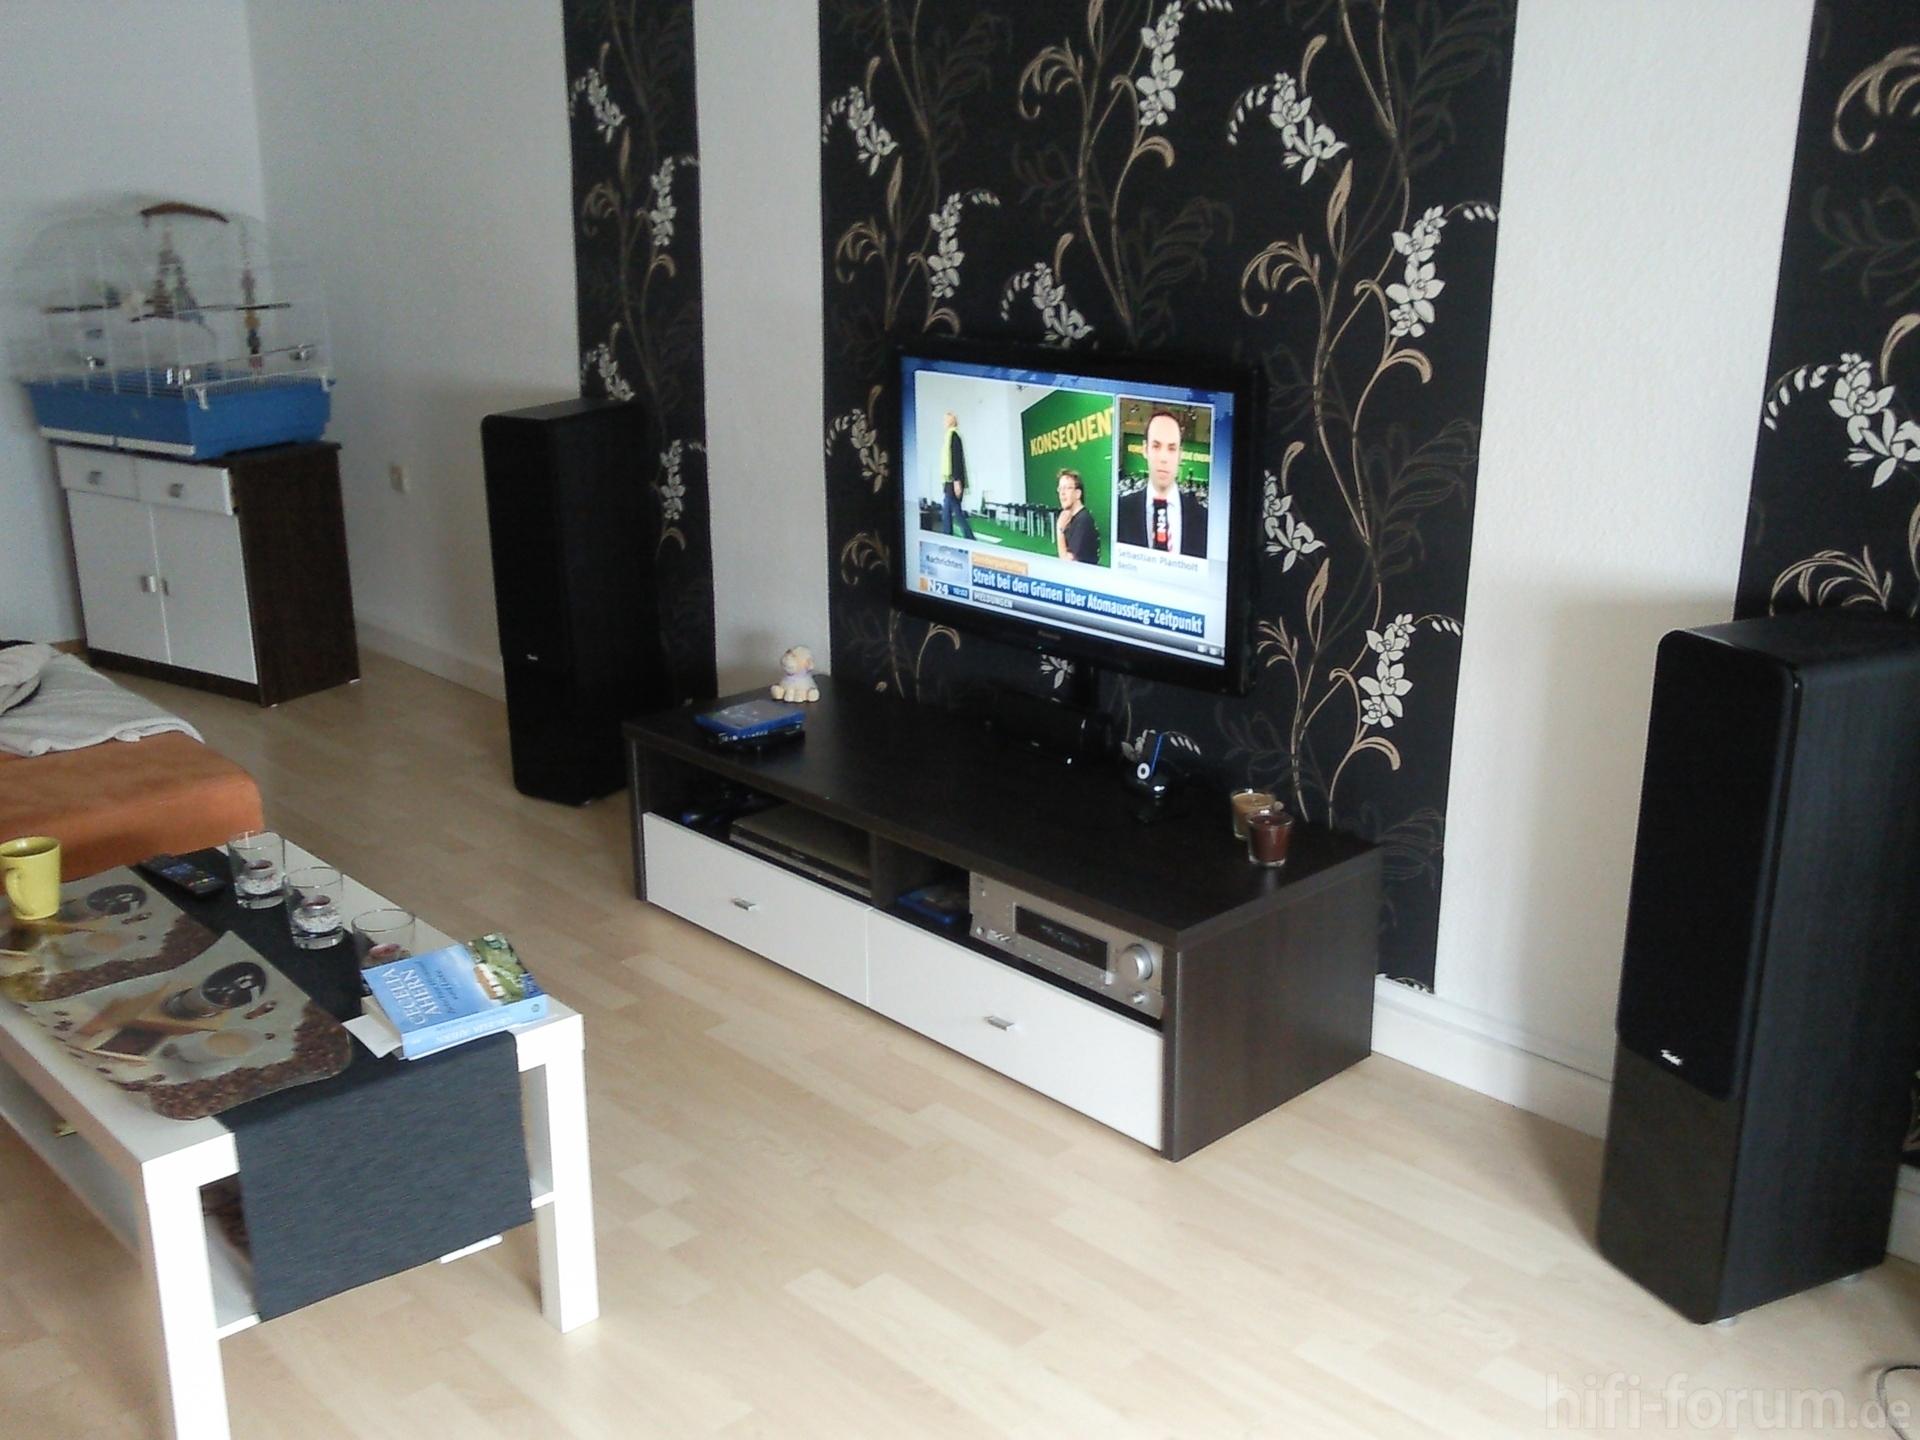 foto0007 foto0007 lautsprecher stereo hifi bildergalerie. Black Bedroom Furniture Sets. Home Design Ideas